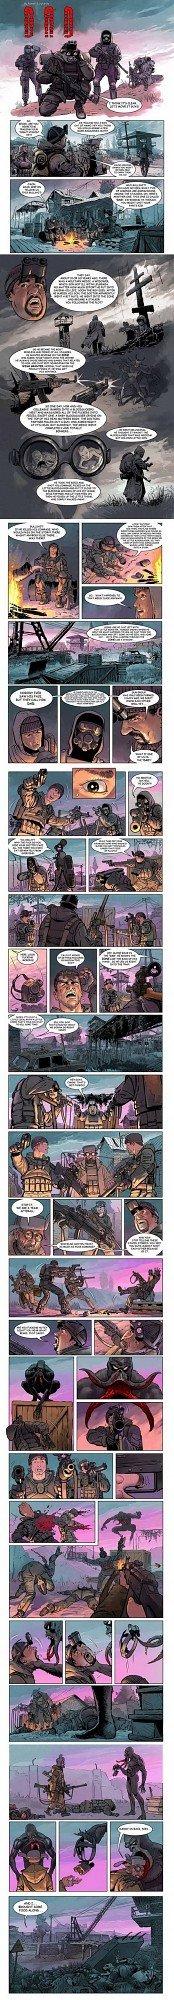 Full S.T.A.L.K.E.R Comic. . Ehi Cal. Seriusly?